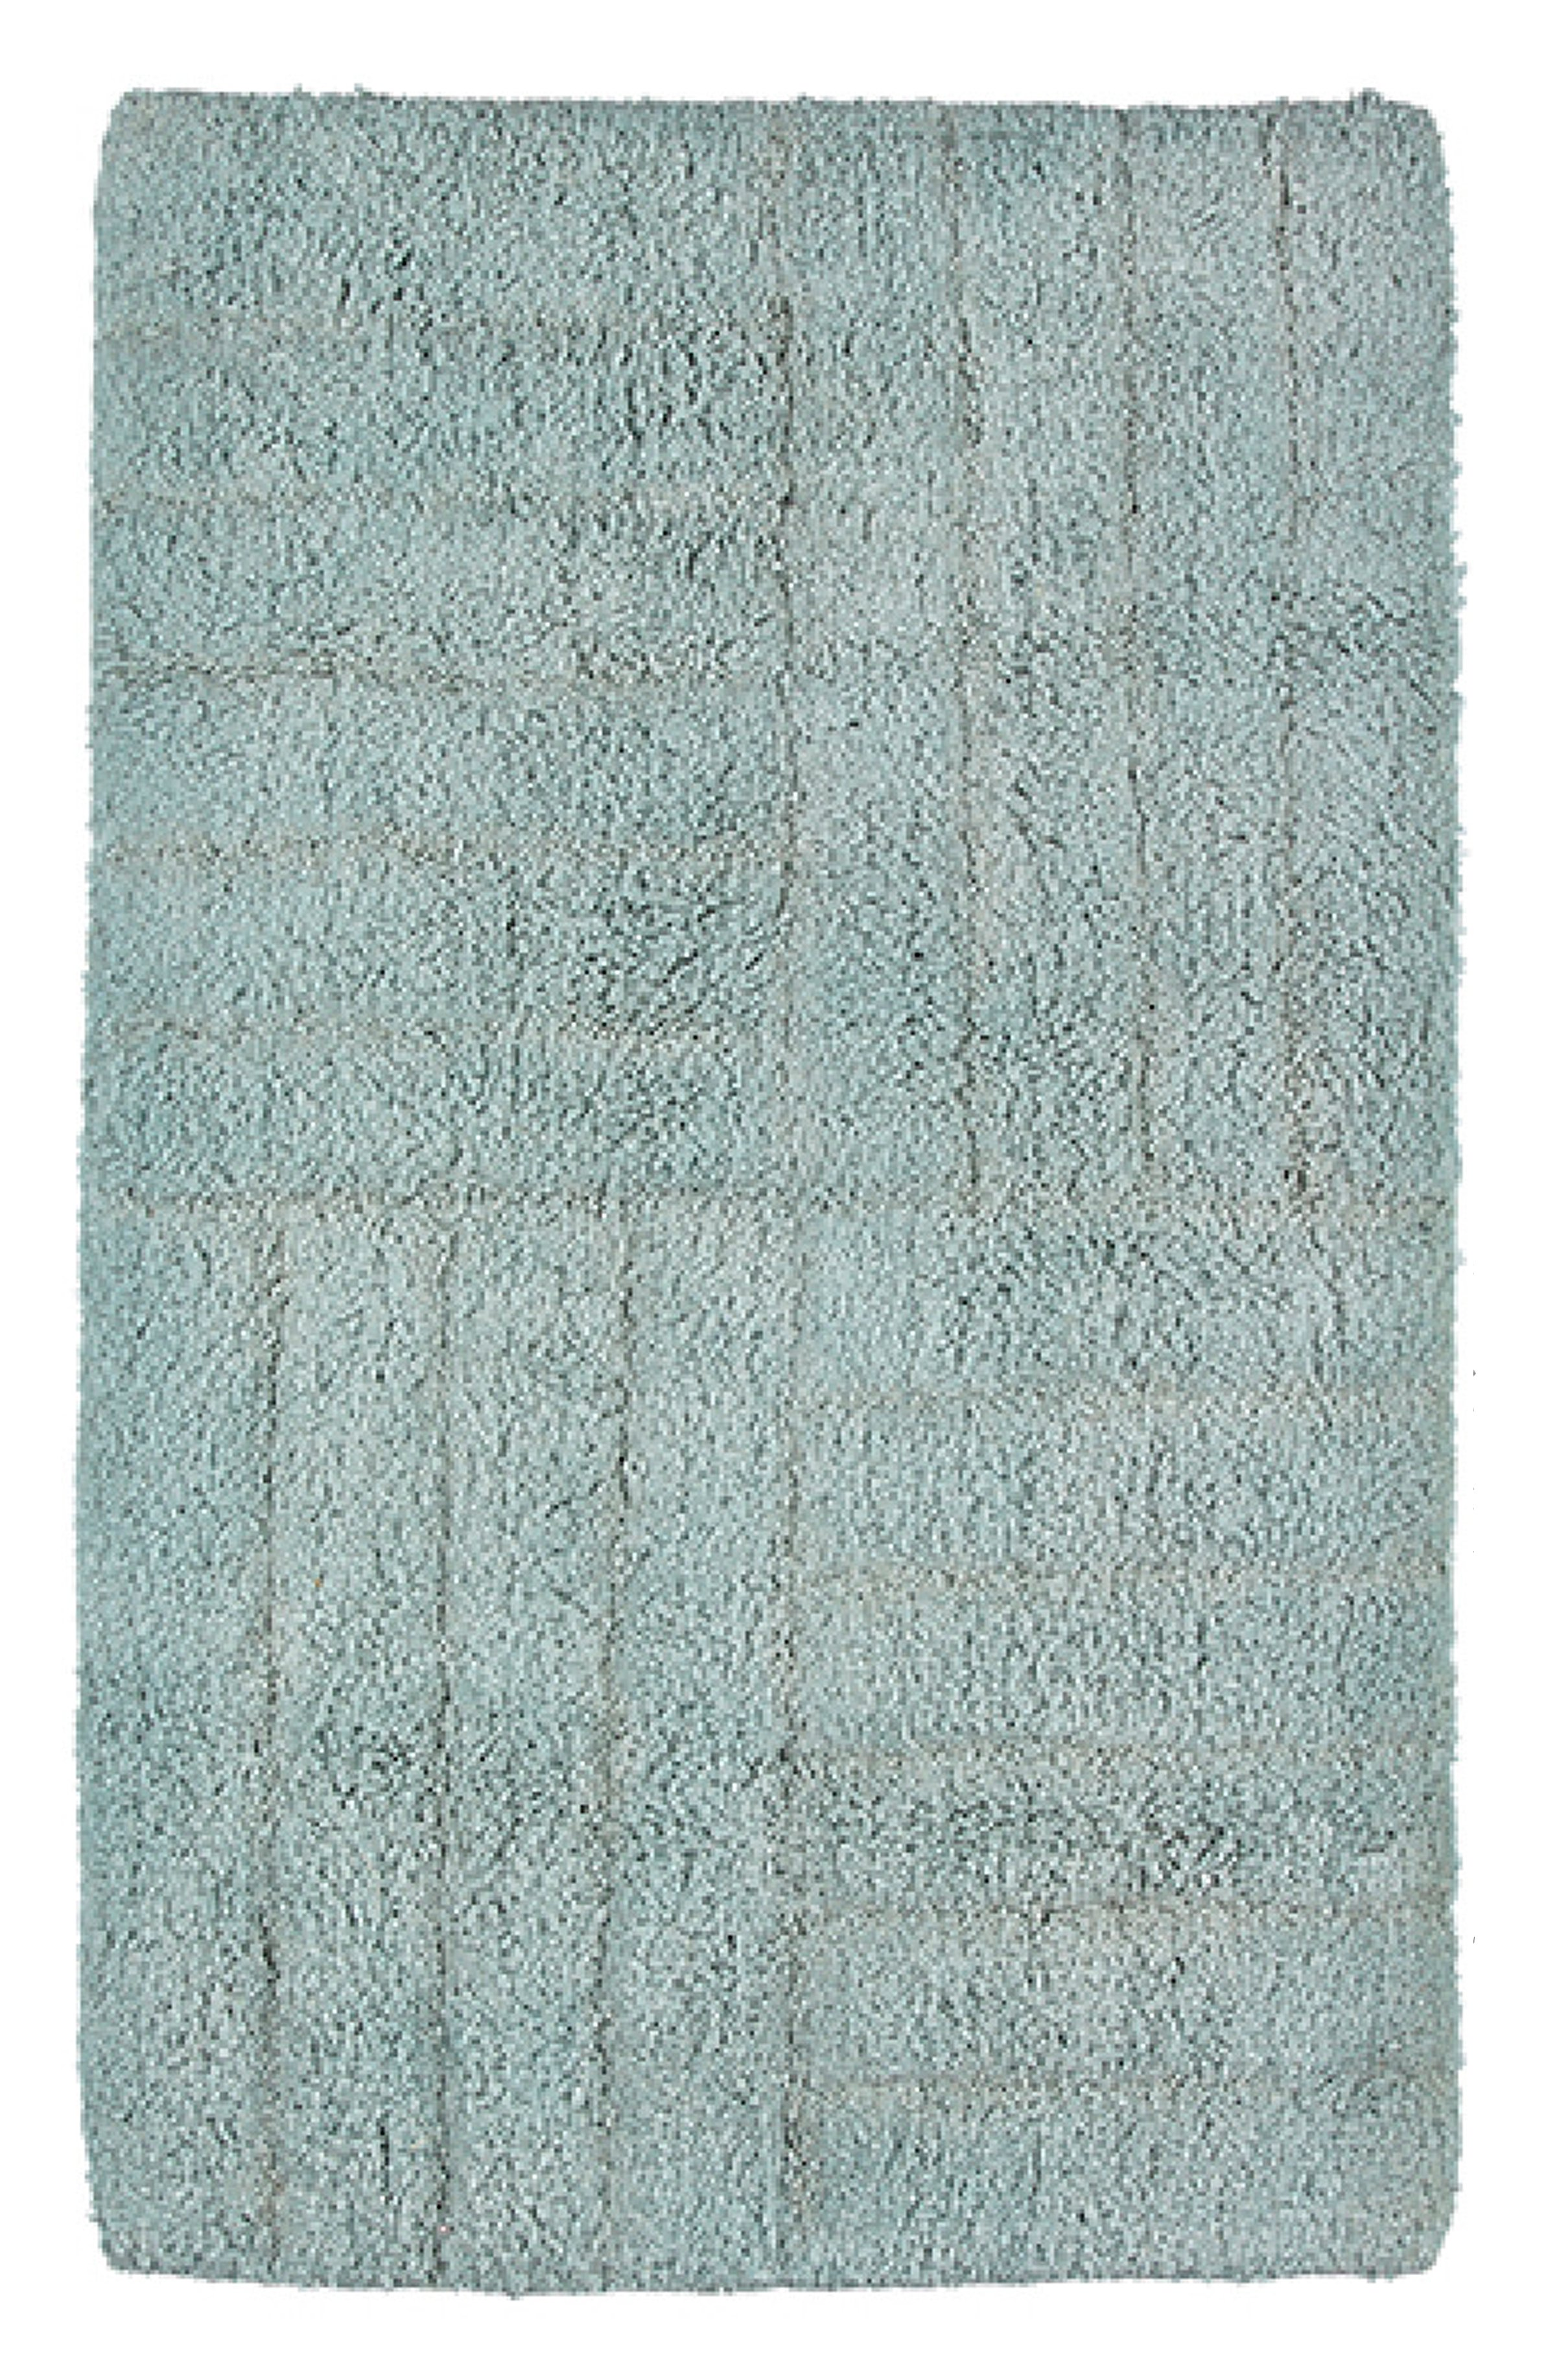 Zone - Bath Mat - Dusty Green (330144)